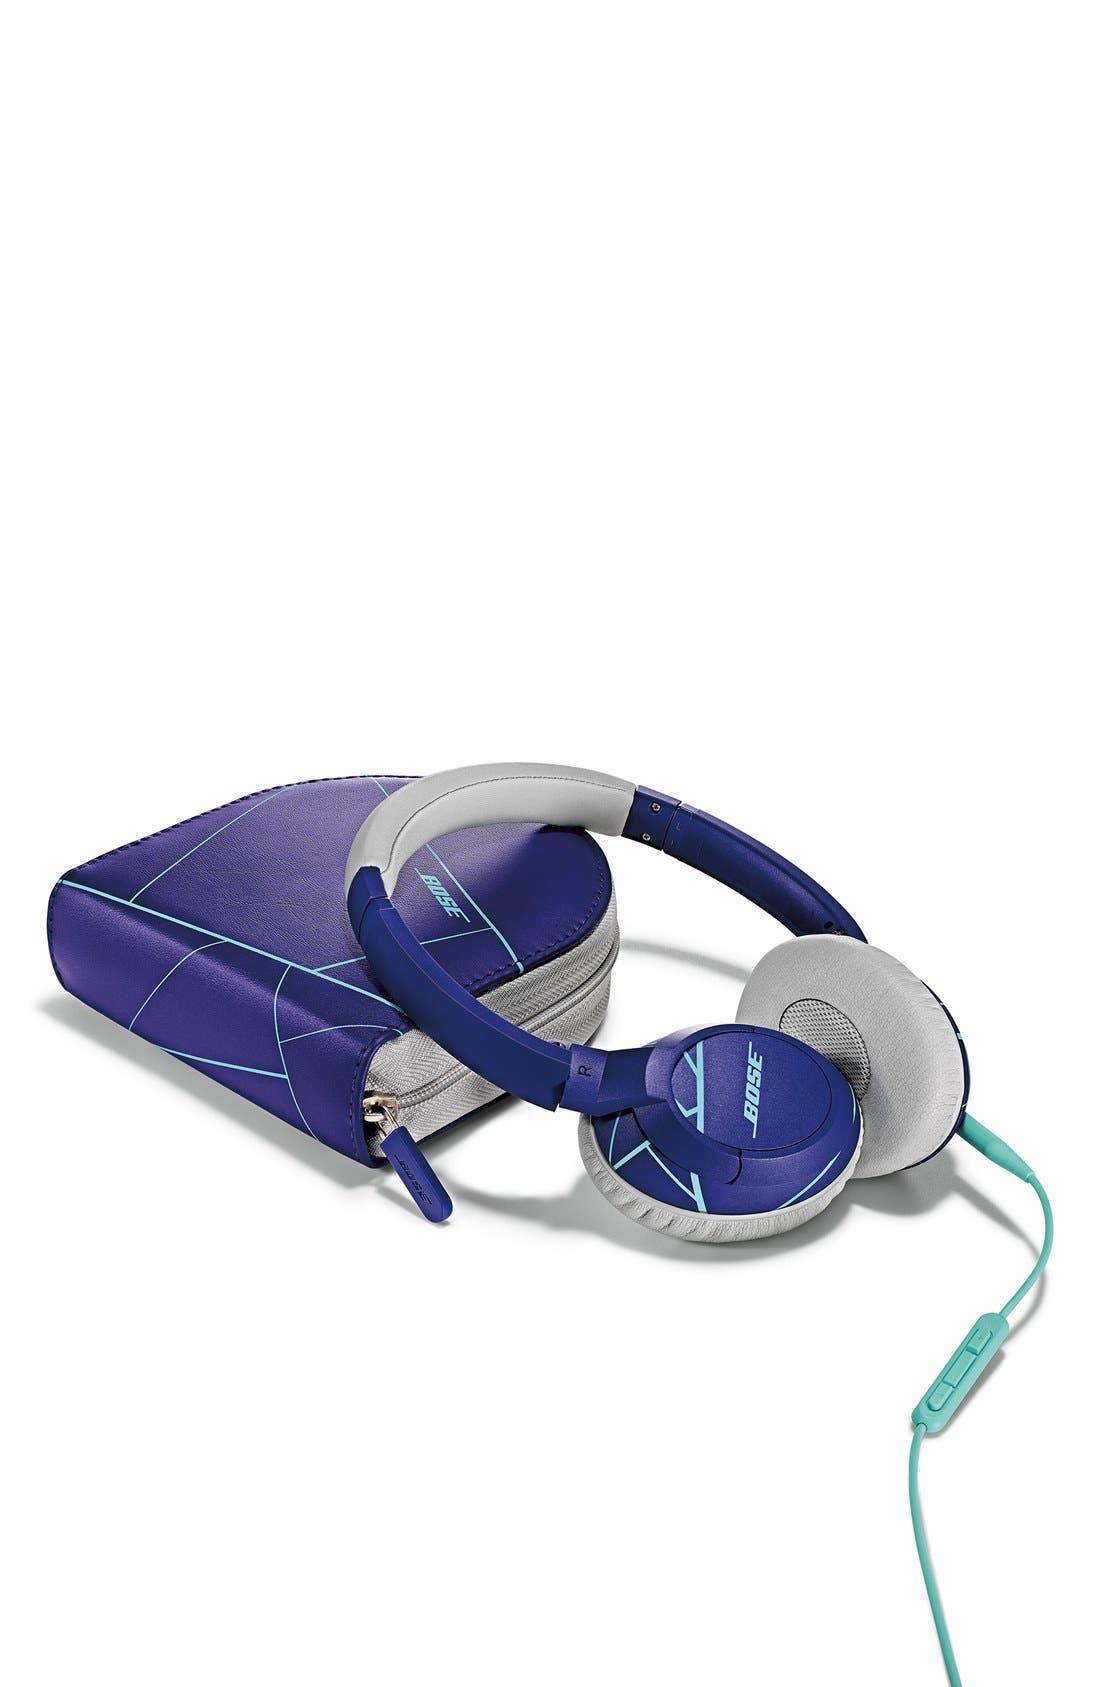 Main Image - Bose® SoundTrue™ On-Ear Headphones